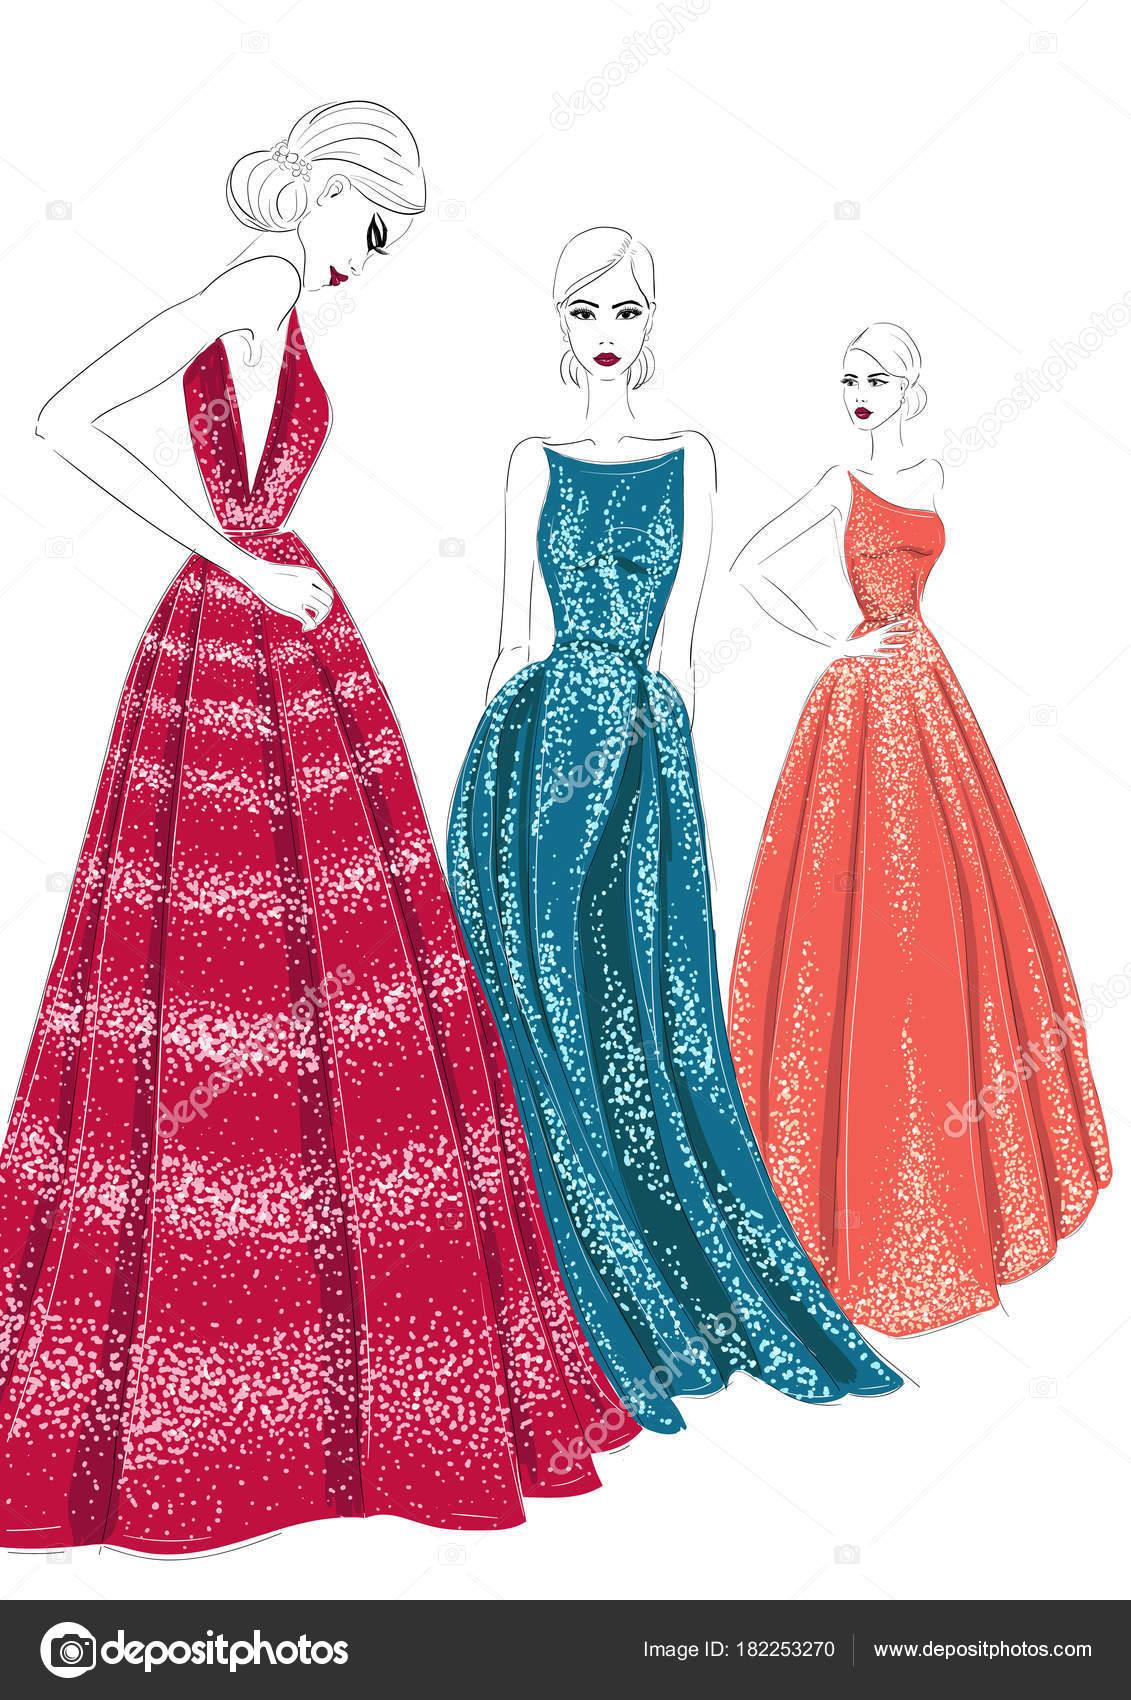 Avondjurken Modellen.Drie Modellen In Couture Jurken Stockvector C Aliona3333 182253270